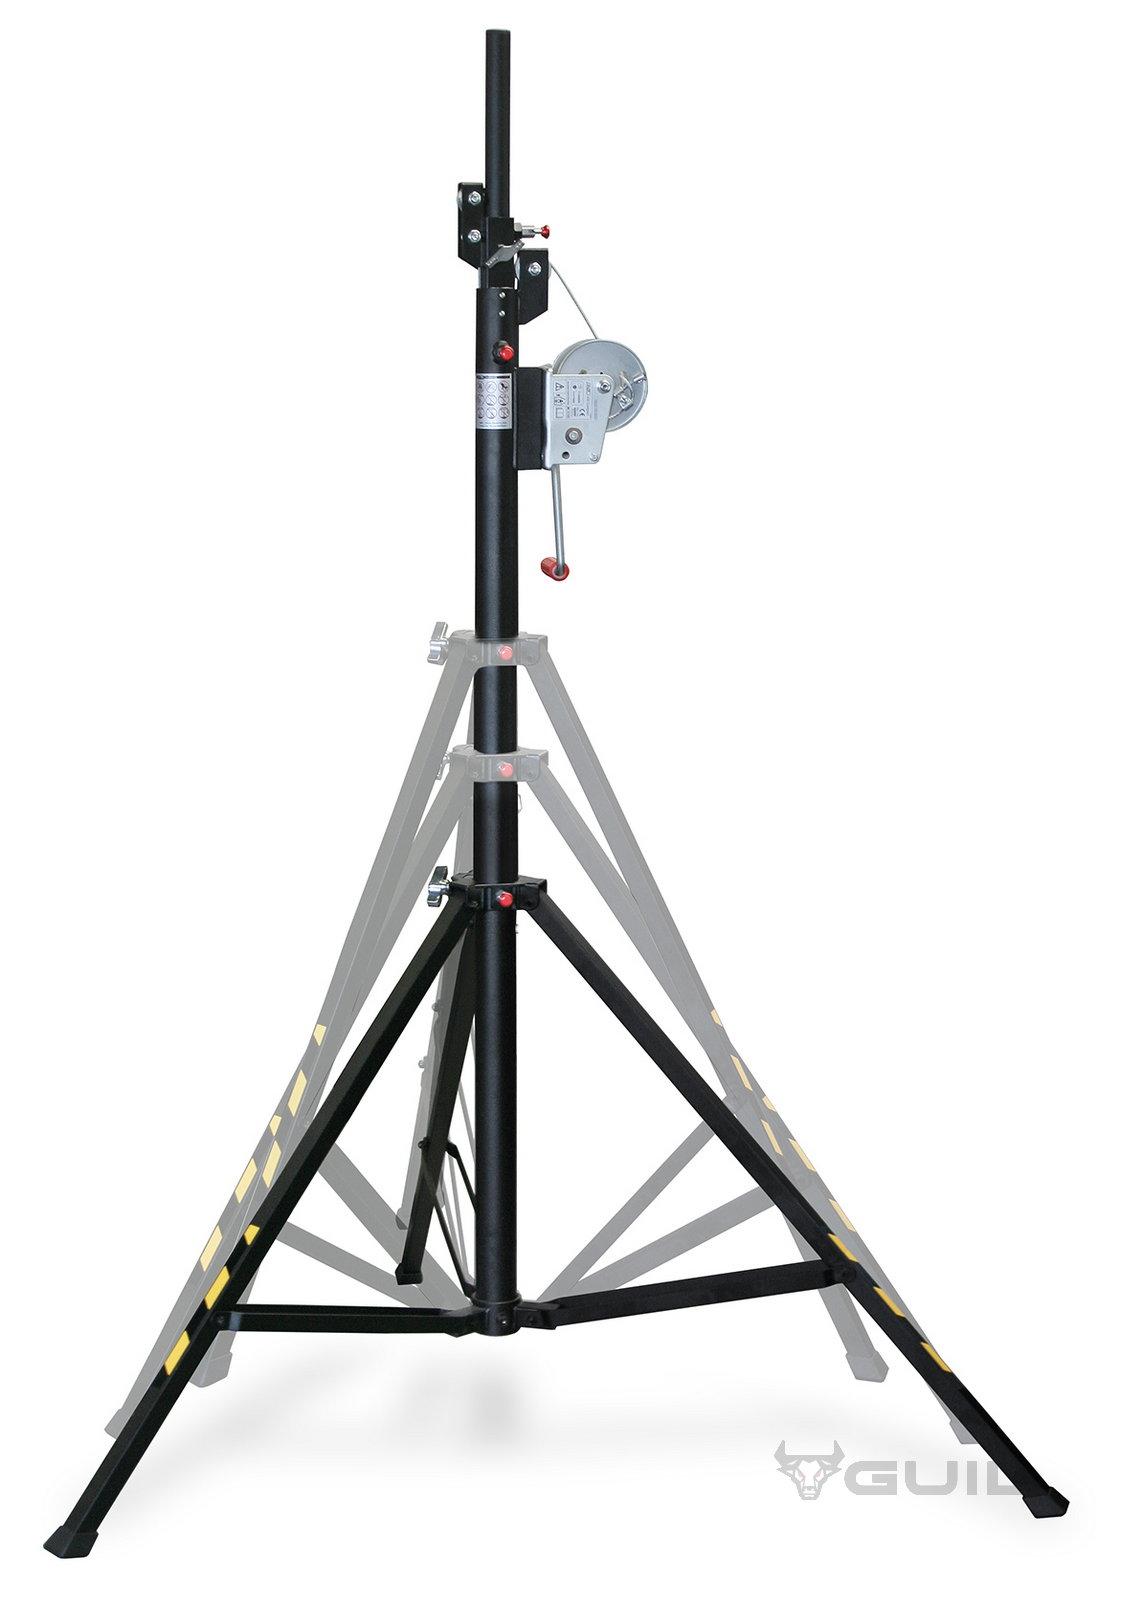 Materiaallift 1,7-4,0 m 100 kg (dutch) (4)